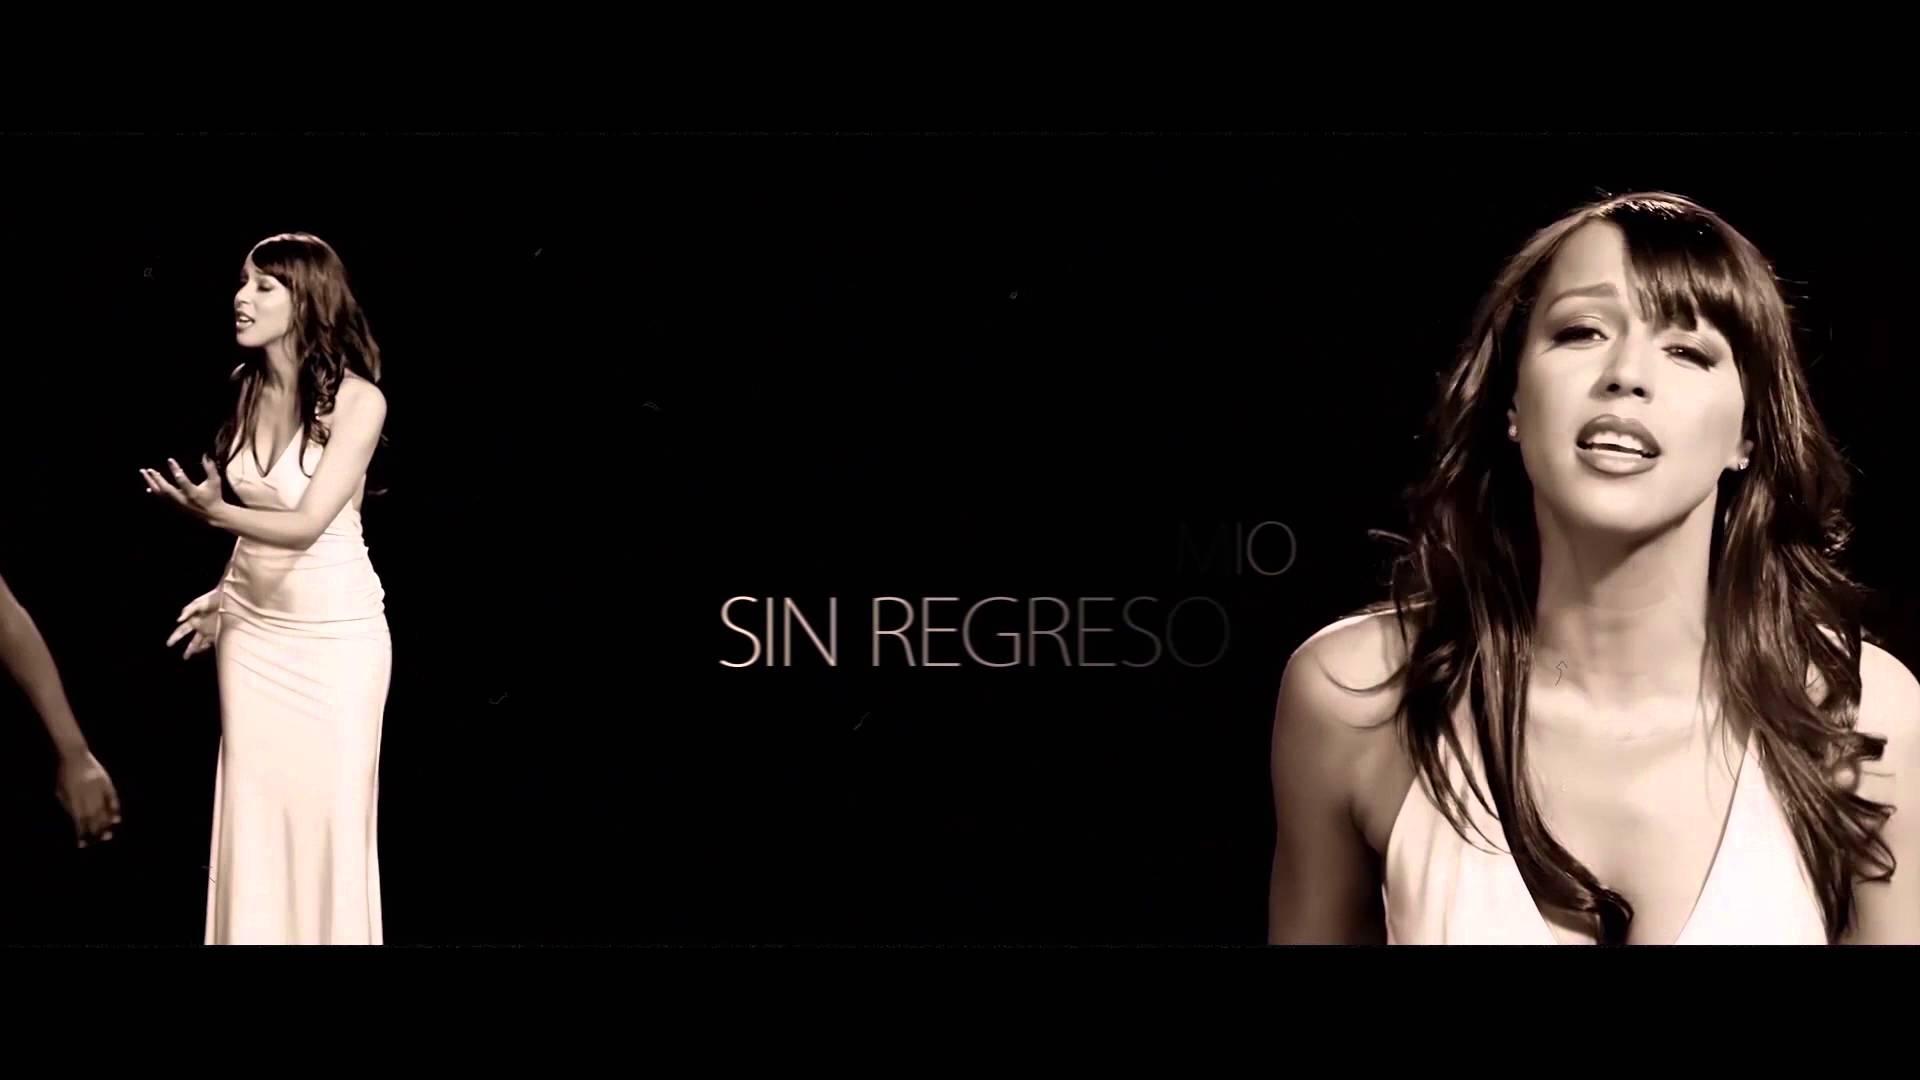 jenny la sexy voz hasta que lo p - Cover: Jenny La Sexy Voz - Calor (Chosen Few Urbano)